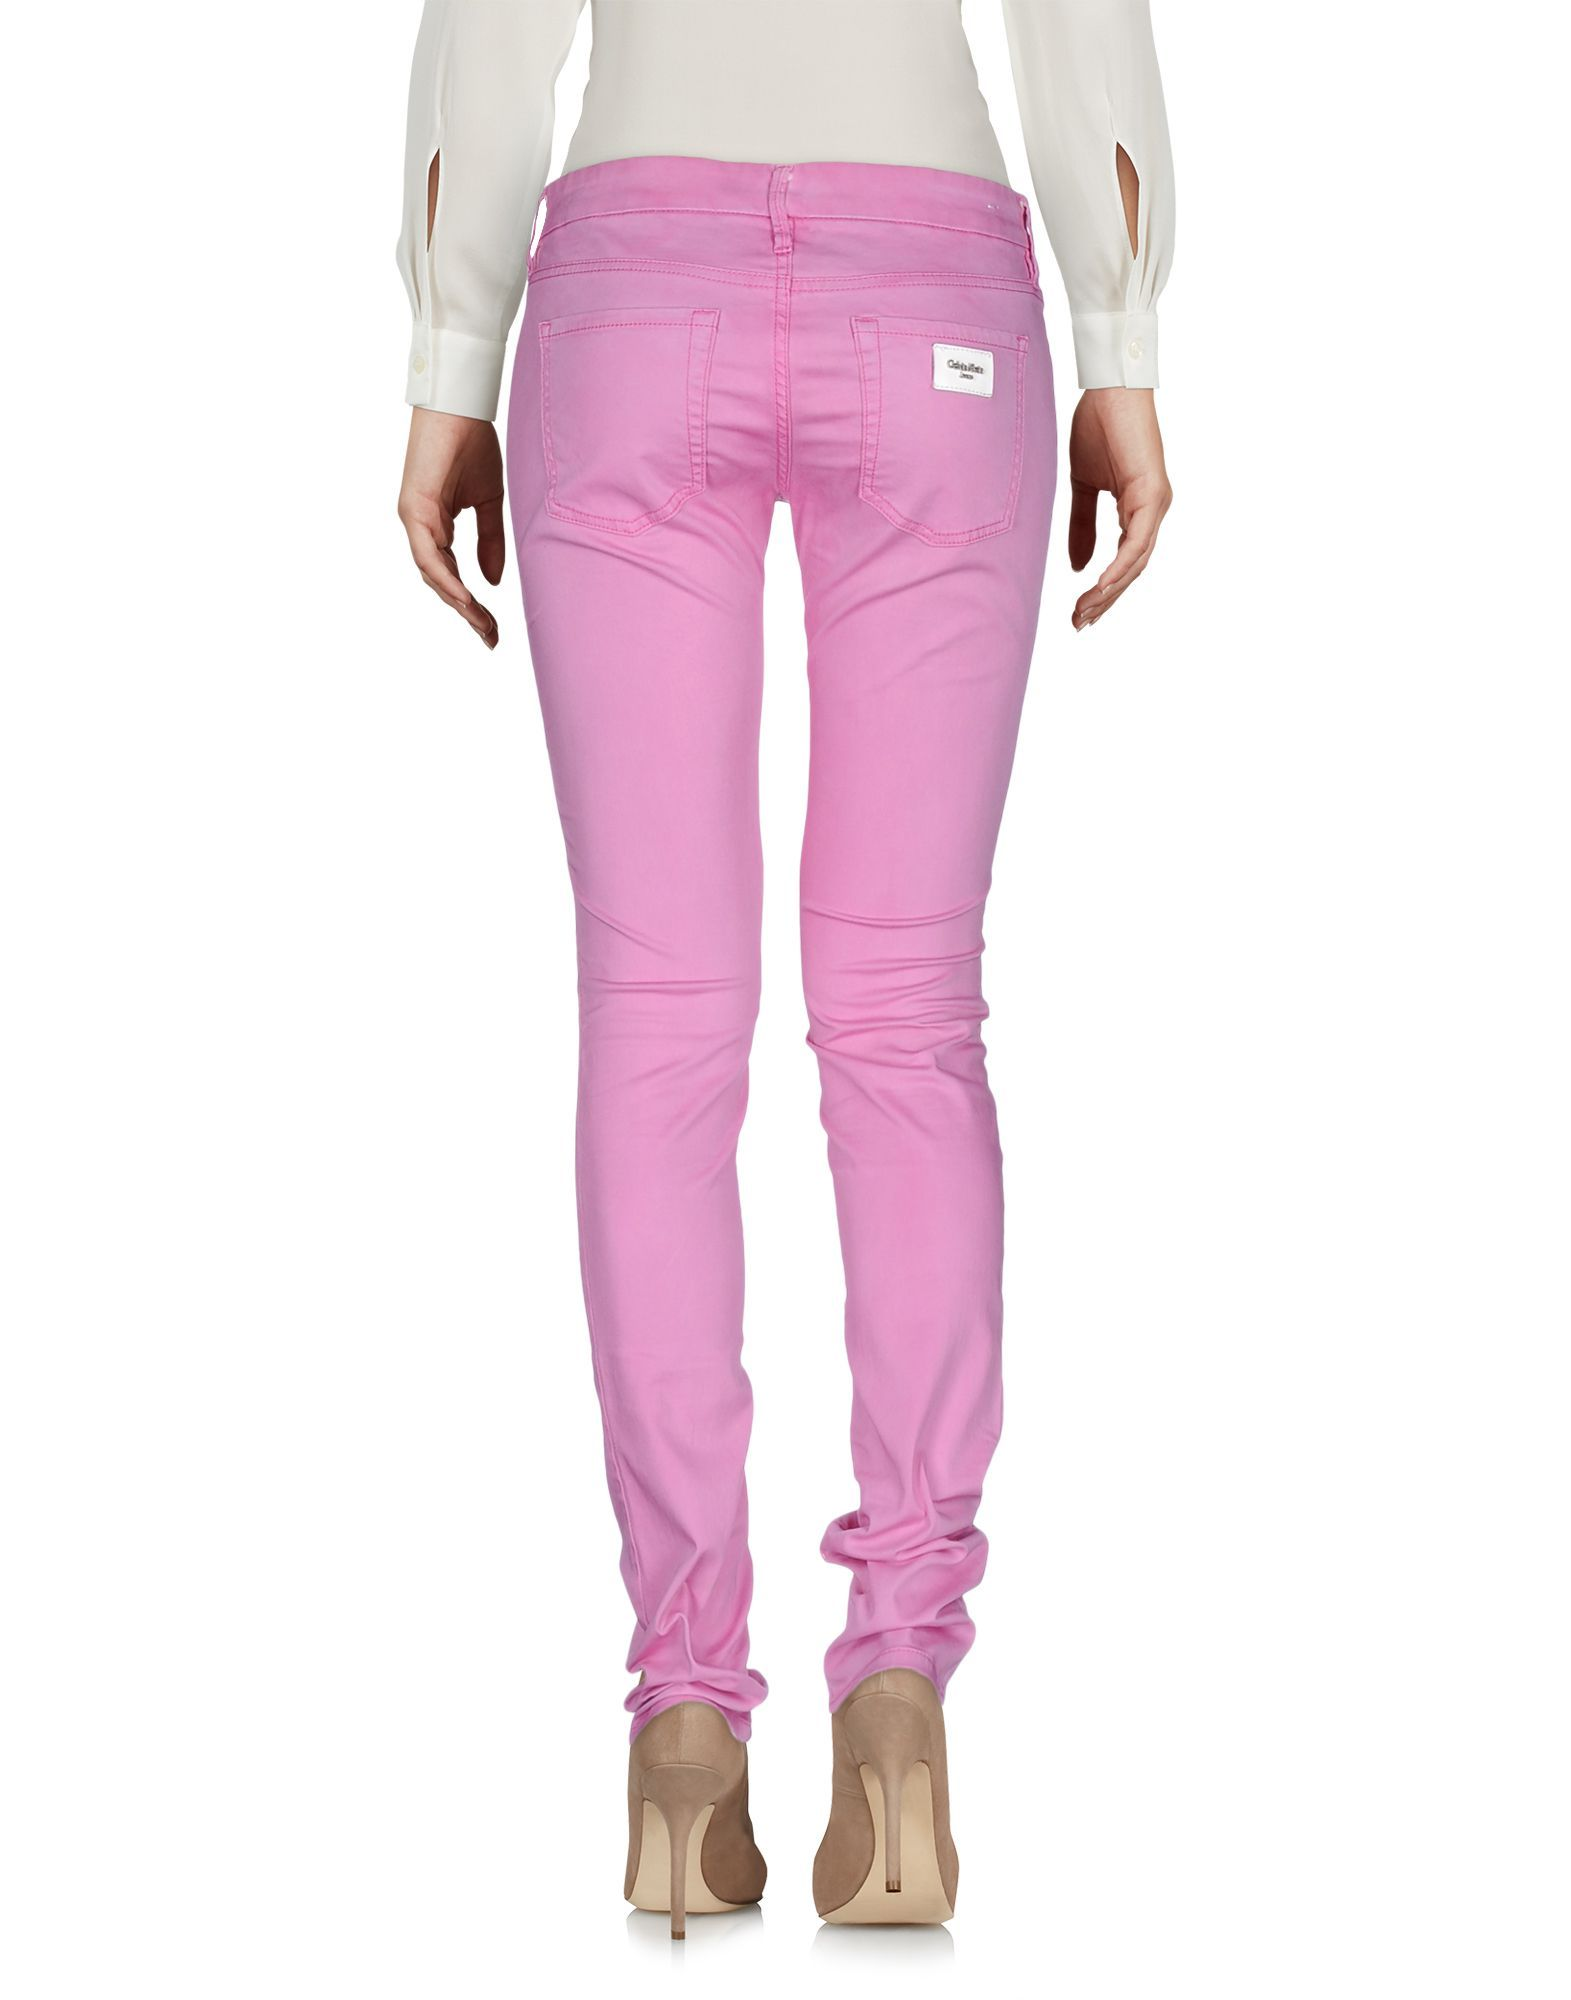 Calvin Klein Jeans Pink Cotton Slim Trousers